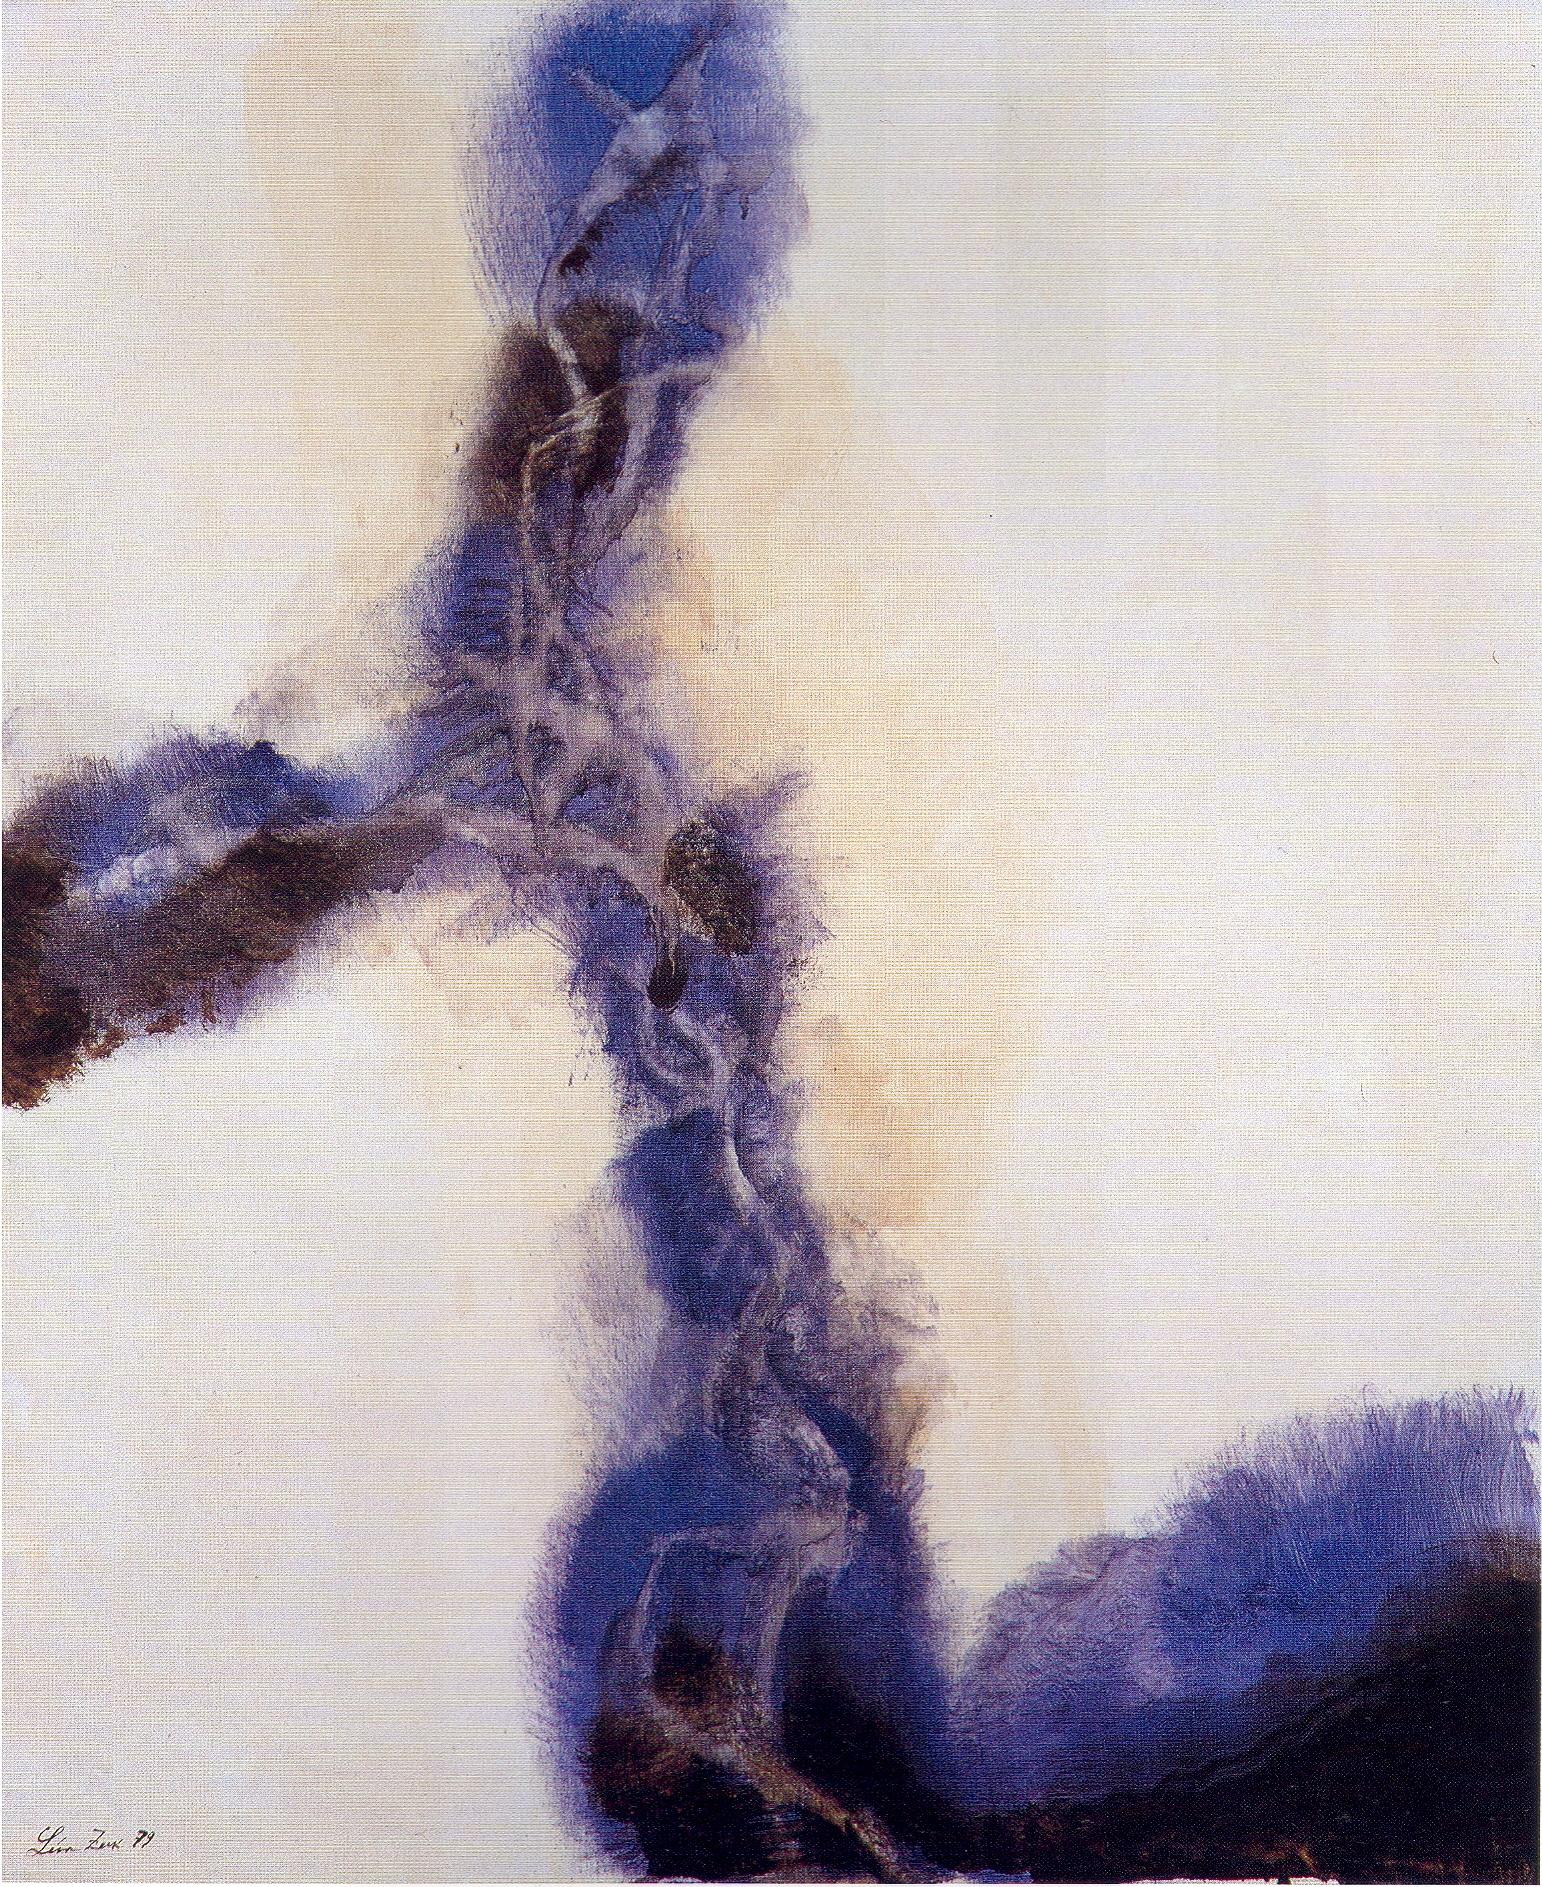 Léon Zack, Sans titre, 1979